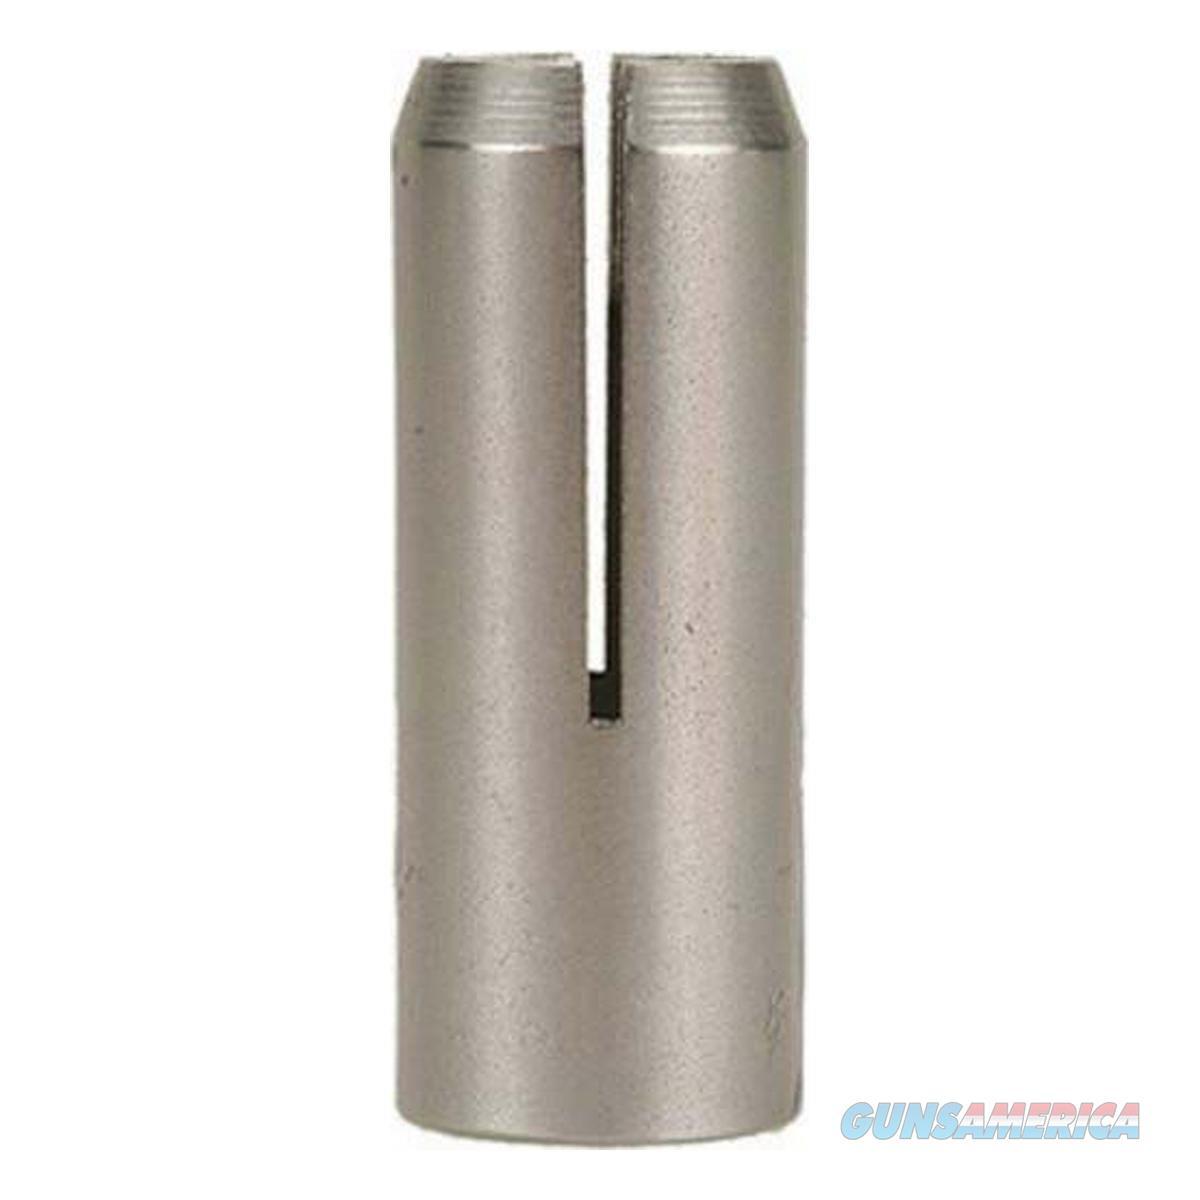 Hornady Cam-Lock Bullet Puller Collet #2 .22/.223  Non-Guns > Reloading > Equipment > Metallic > Misc